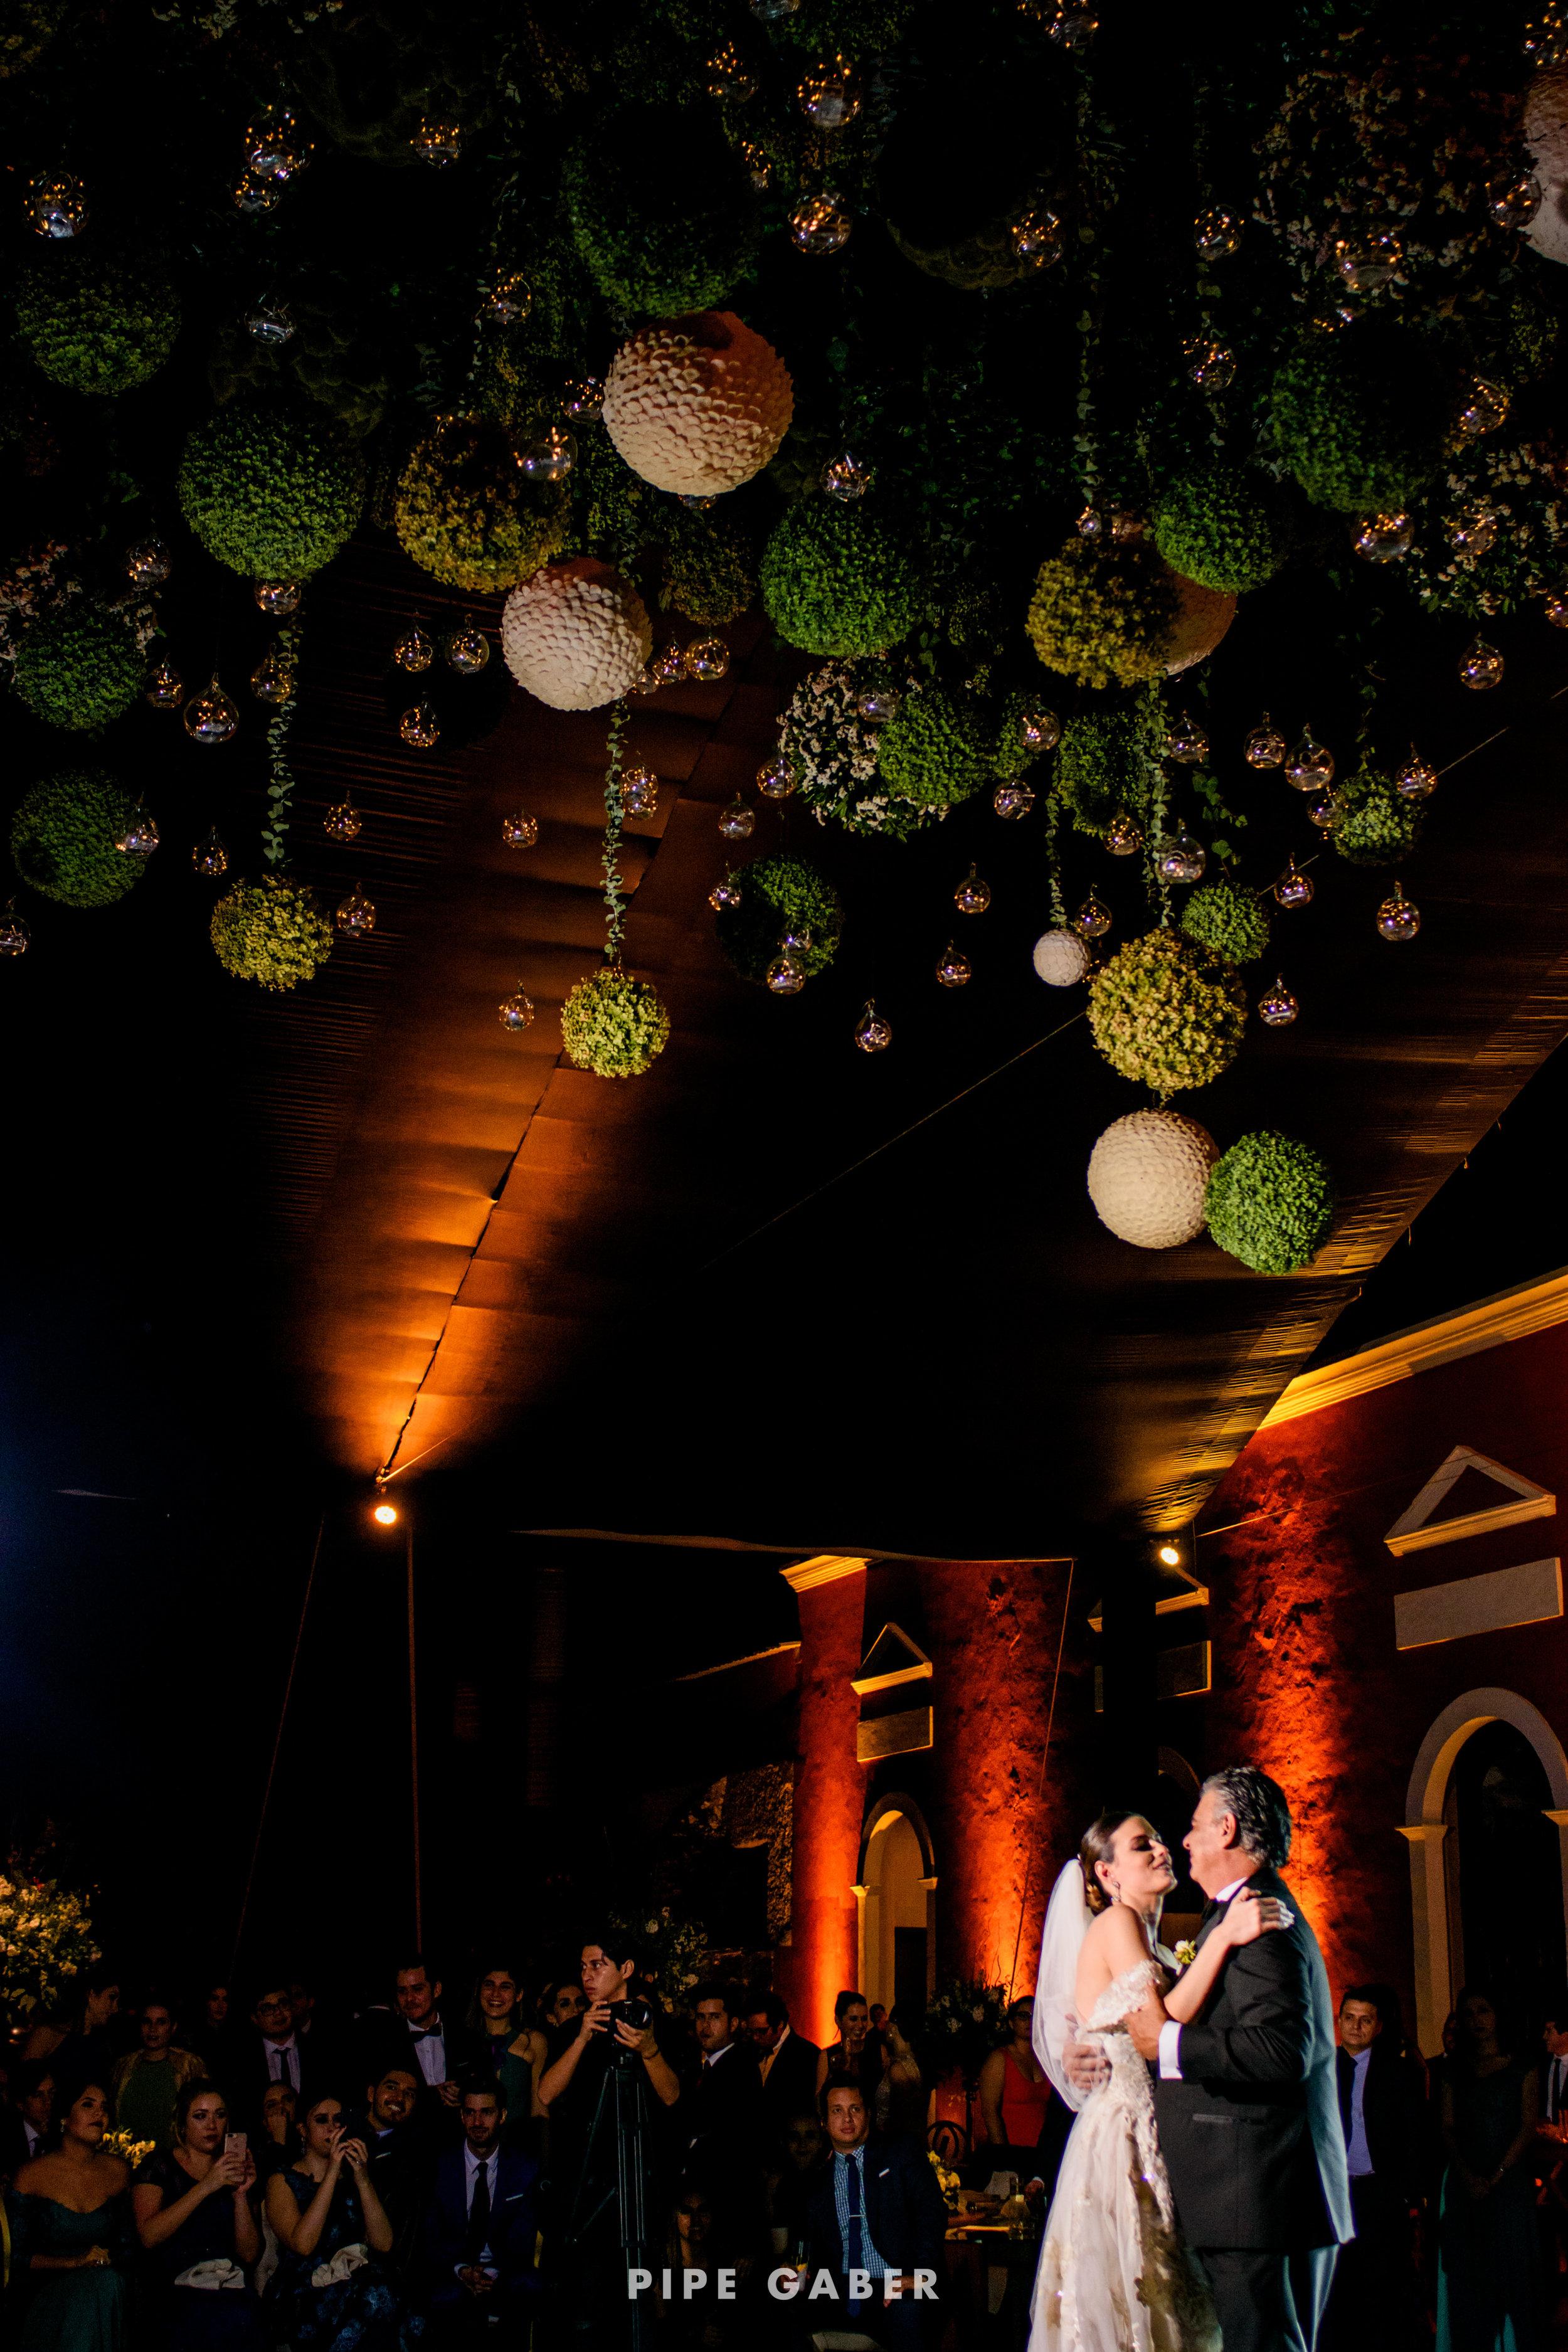 18_02_03_WEDDING_ALEXIS_ABIMERHI_ERICK_APT_2416.jpg